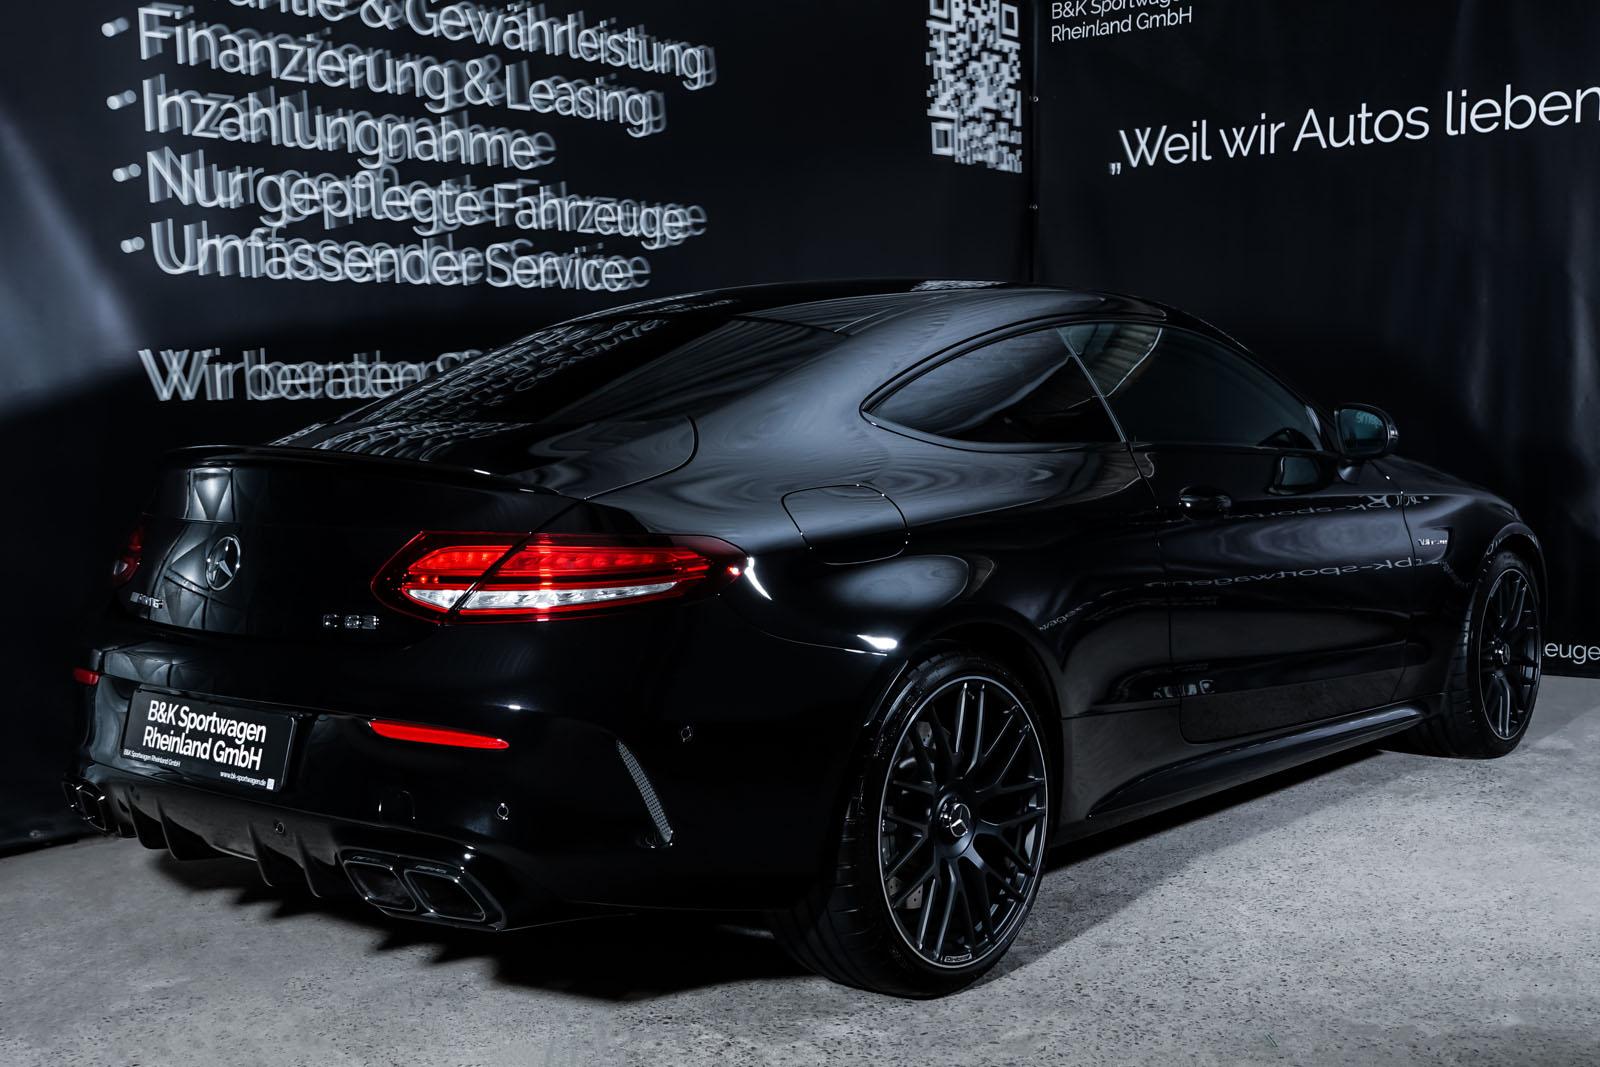 MercedesBenz_C63_AMG_Schwarz_Schwarz_MB-5973_8_w